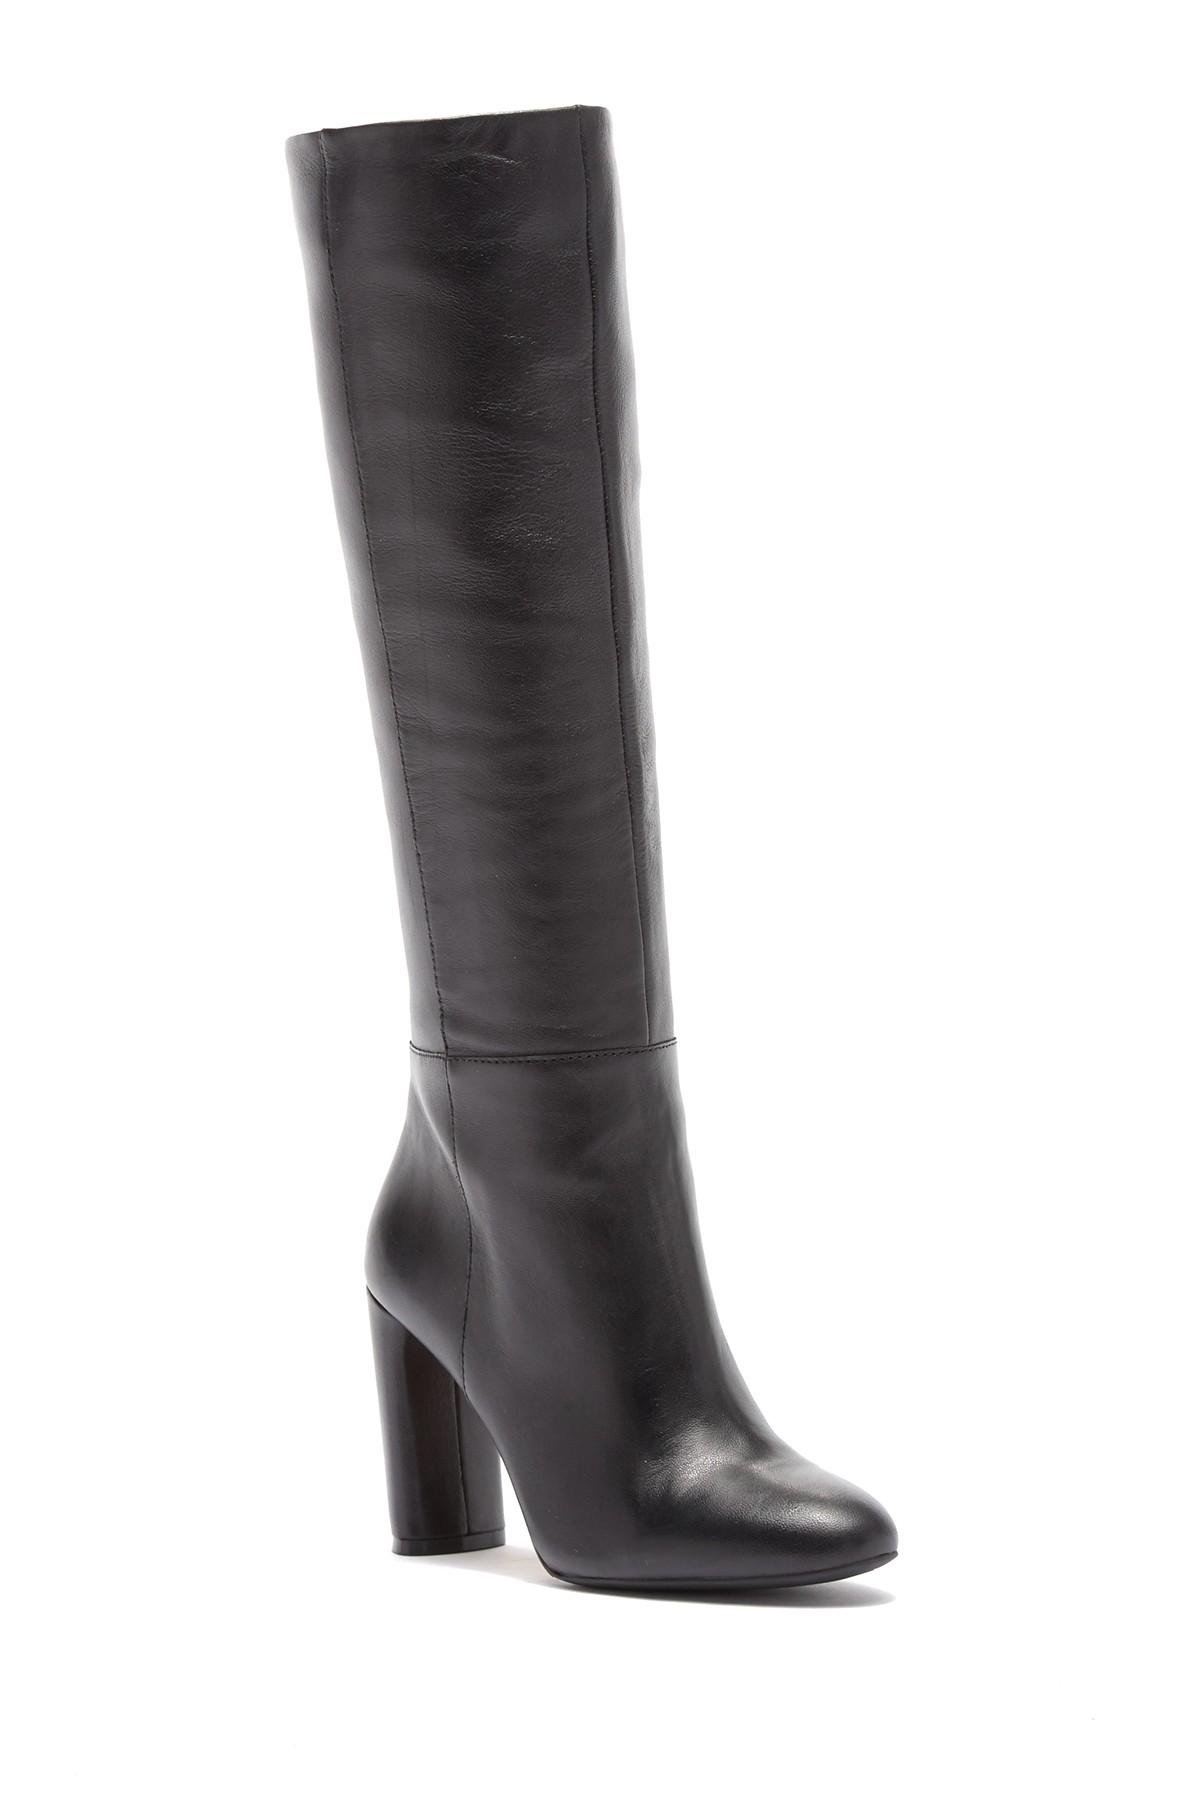 07b92f199d9 Lyst vince camuto femmie tall shaft boot in black jpg 1200x1800 Vince  camuto tall shaft boots